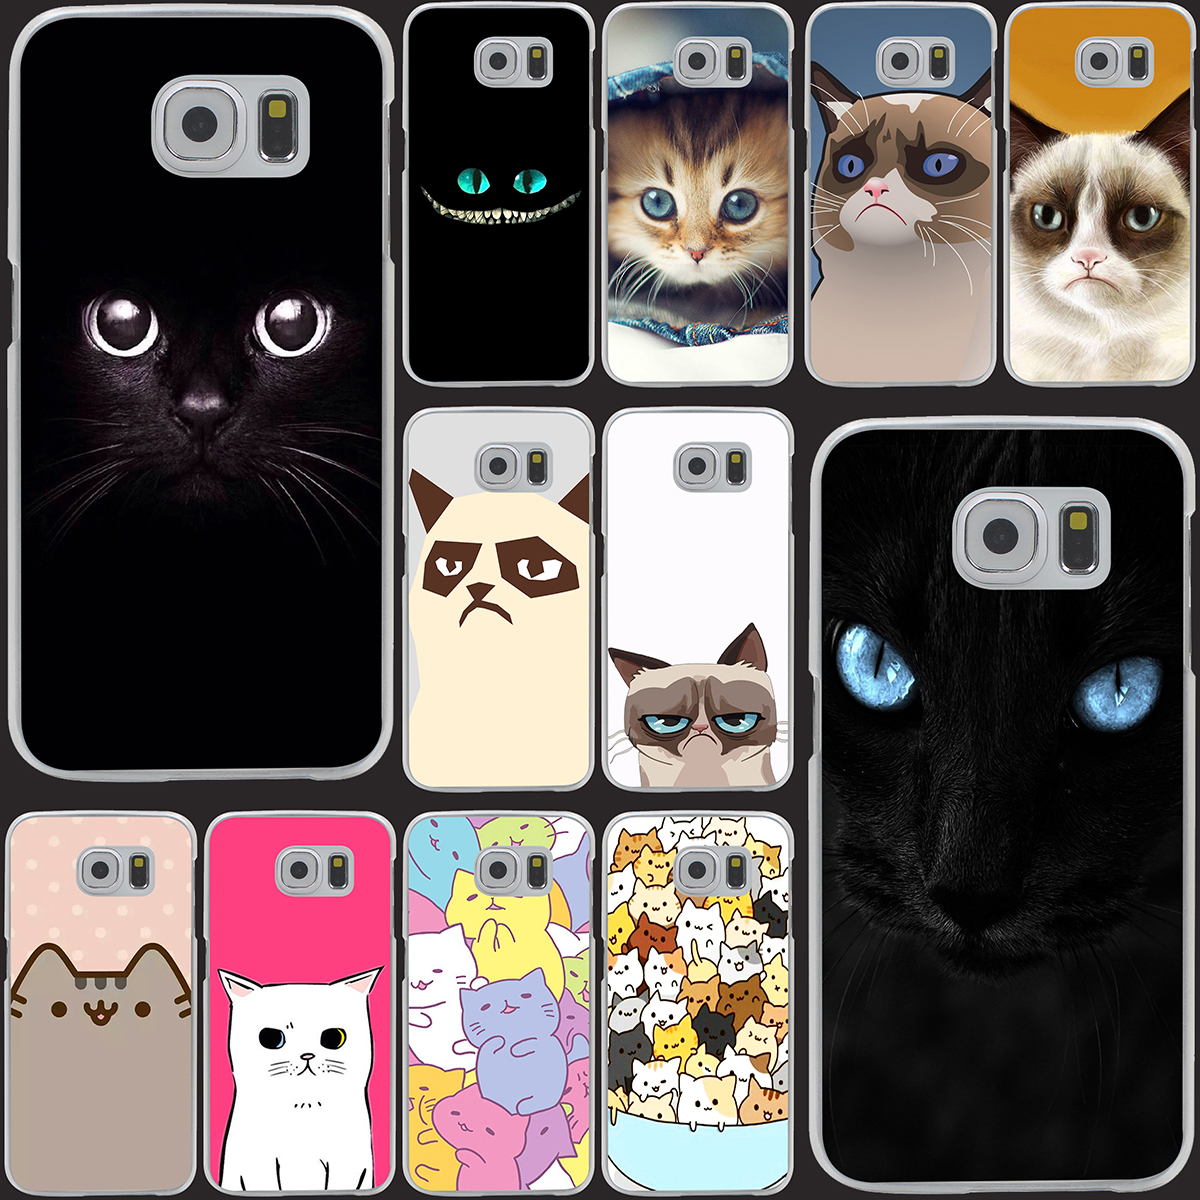 288Z- Black cat back Hrad Style Case Cover for Samsung Galaxy S5 S4 S3 I9600 I9500 I9300 1PC